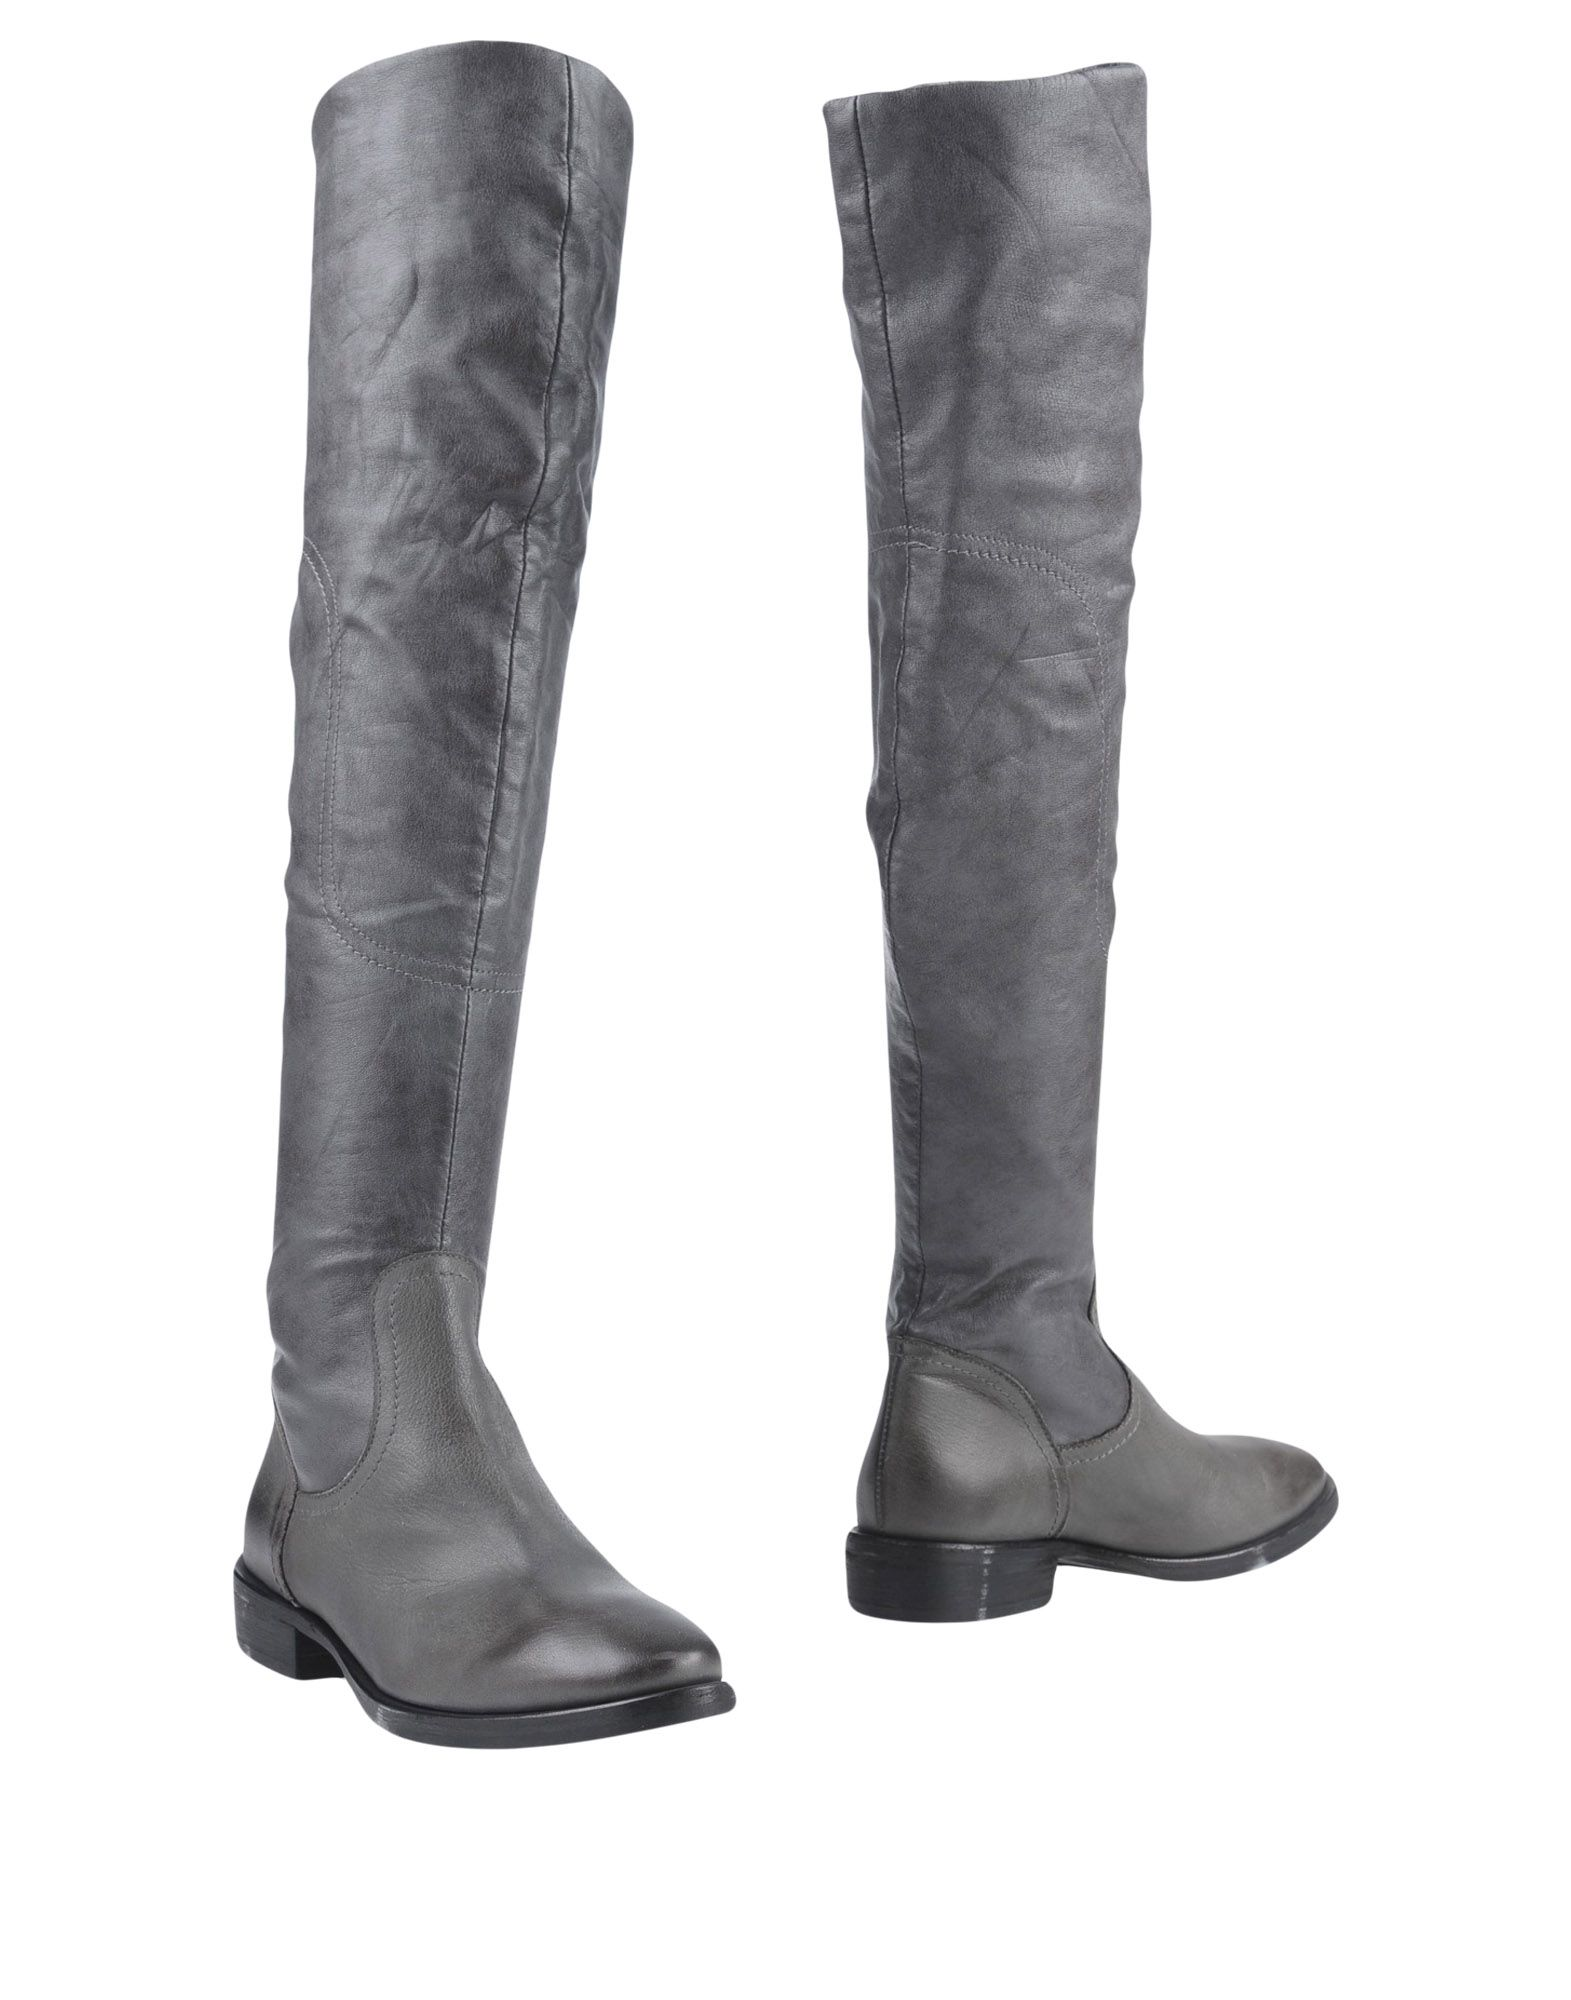 JFK Damen Stiefel Farbe Grau Größe 7